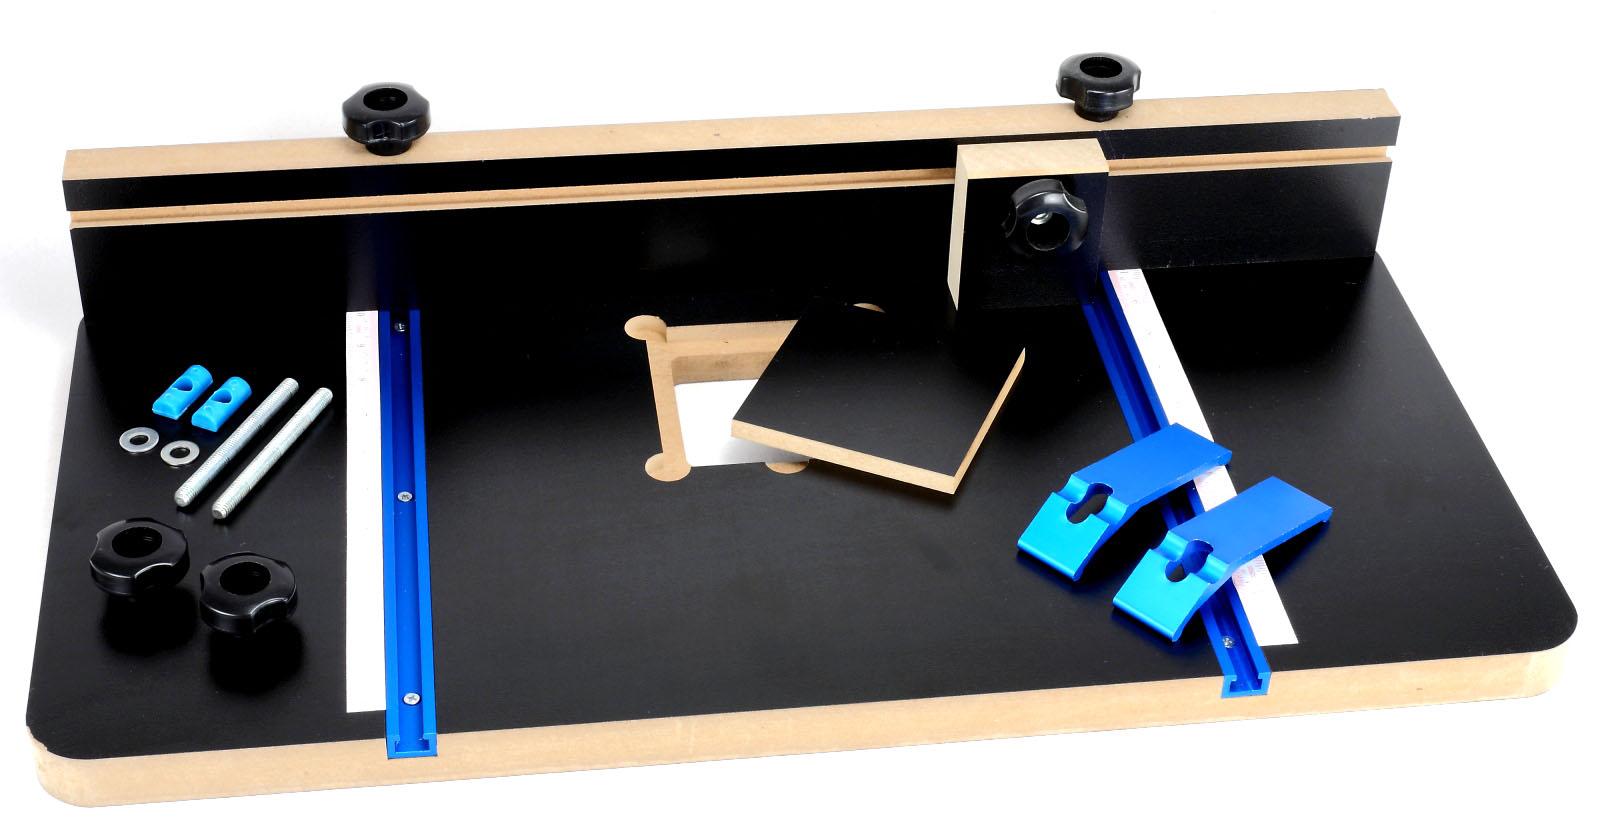 bohrtisch f r st nderbohrmaschine bohrst nder tischbohrmaschine bohrmaschine ebay. Black Bedroom Furniture Sets. Home Design Ideas